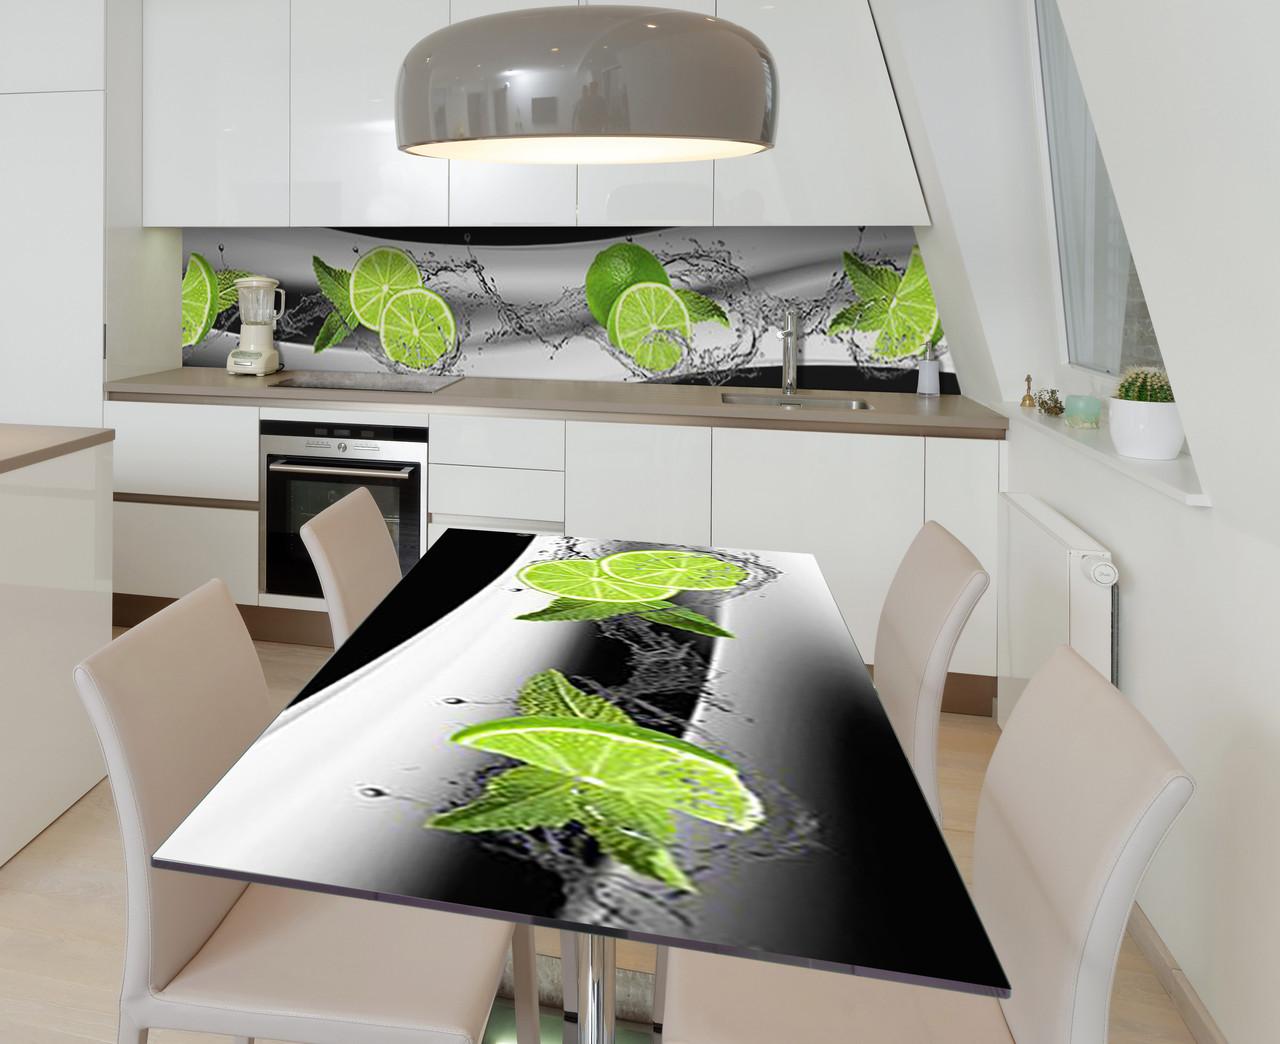 Наклейка 3Д виниловая на стол Zatarga «Купание лайма» 650х1200 мм для домов, квартир, столов, кофейн, кафе